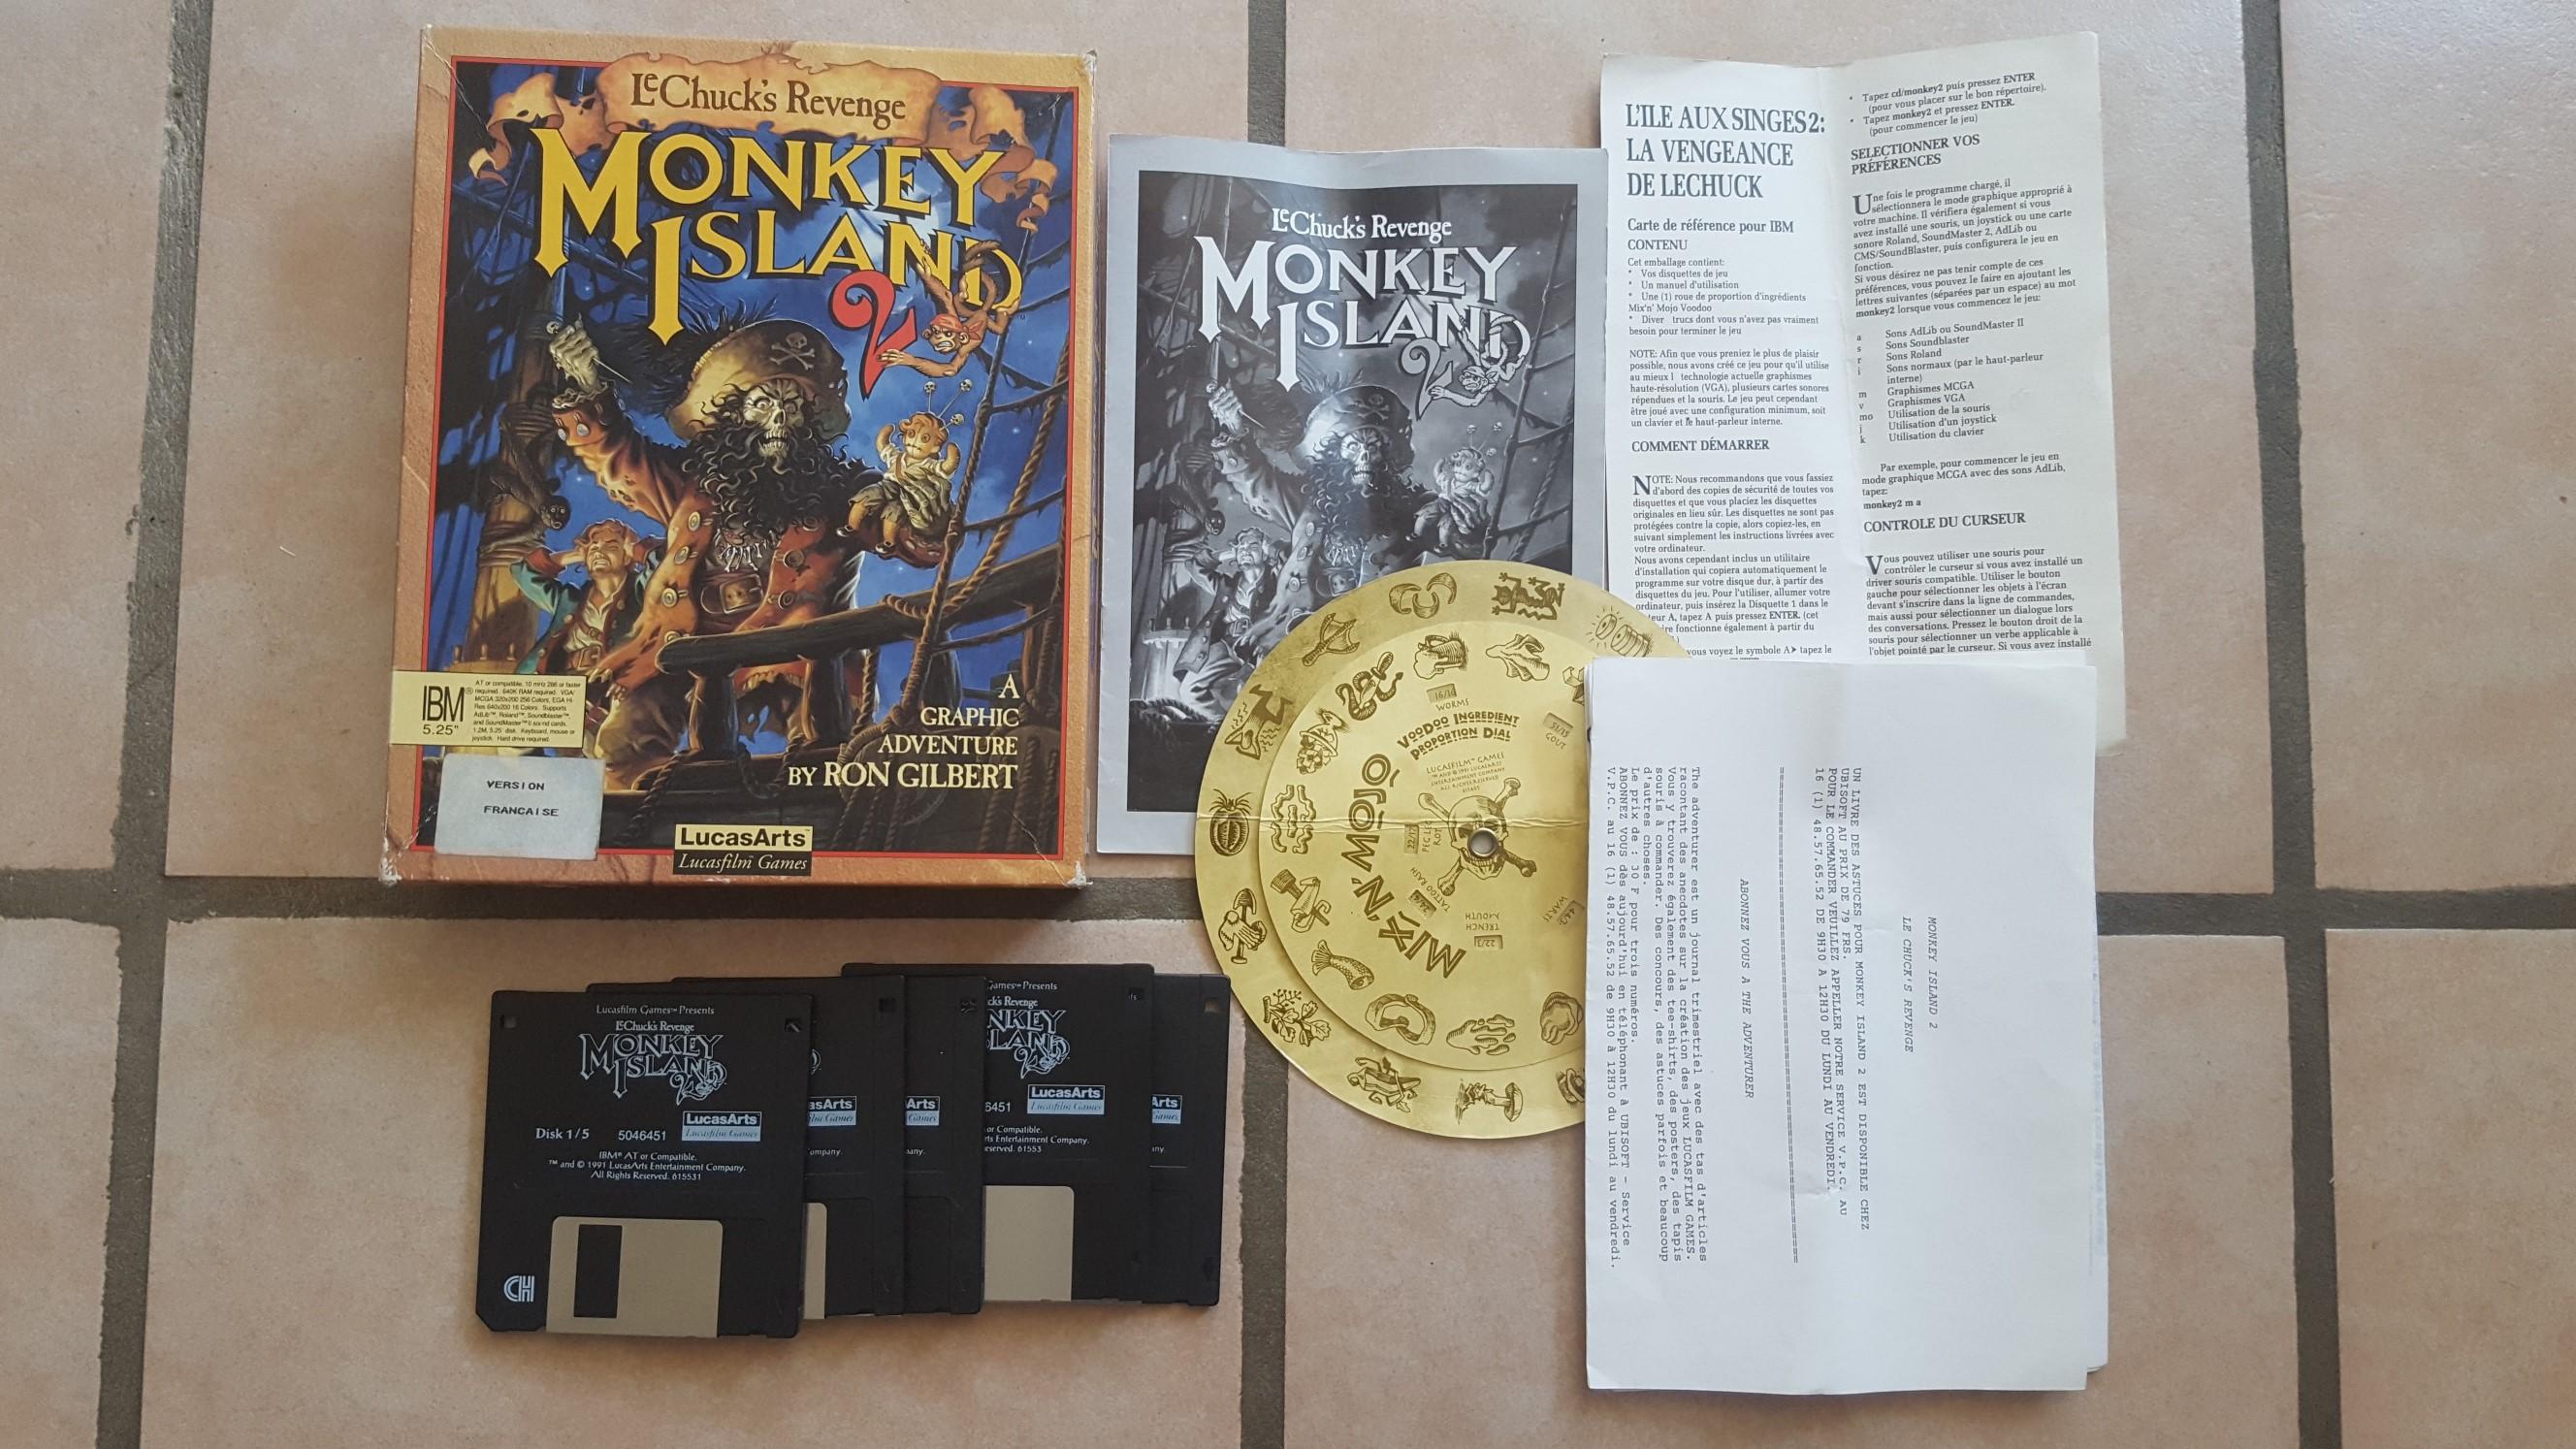 Vente ordinateurs et jeux Atari, Amiga, Amstrad et PC MAJ 20/01 - Page 6 KWk7L